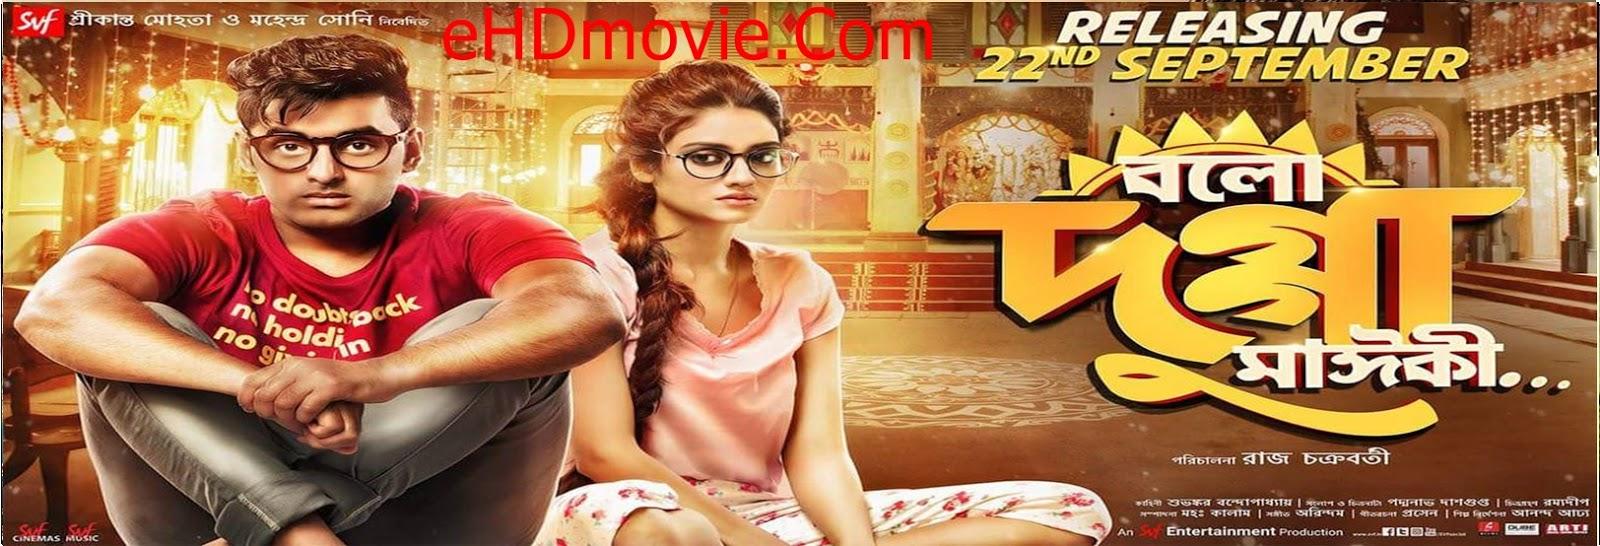 Bolo Dugga Maiki 2017 Bengali Full Movie Original 480p - HEVC - 720p ORG WEB-Rip 400MB - 750MB - 1.2GB